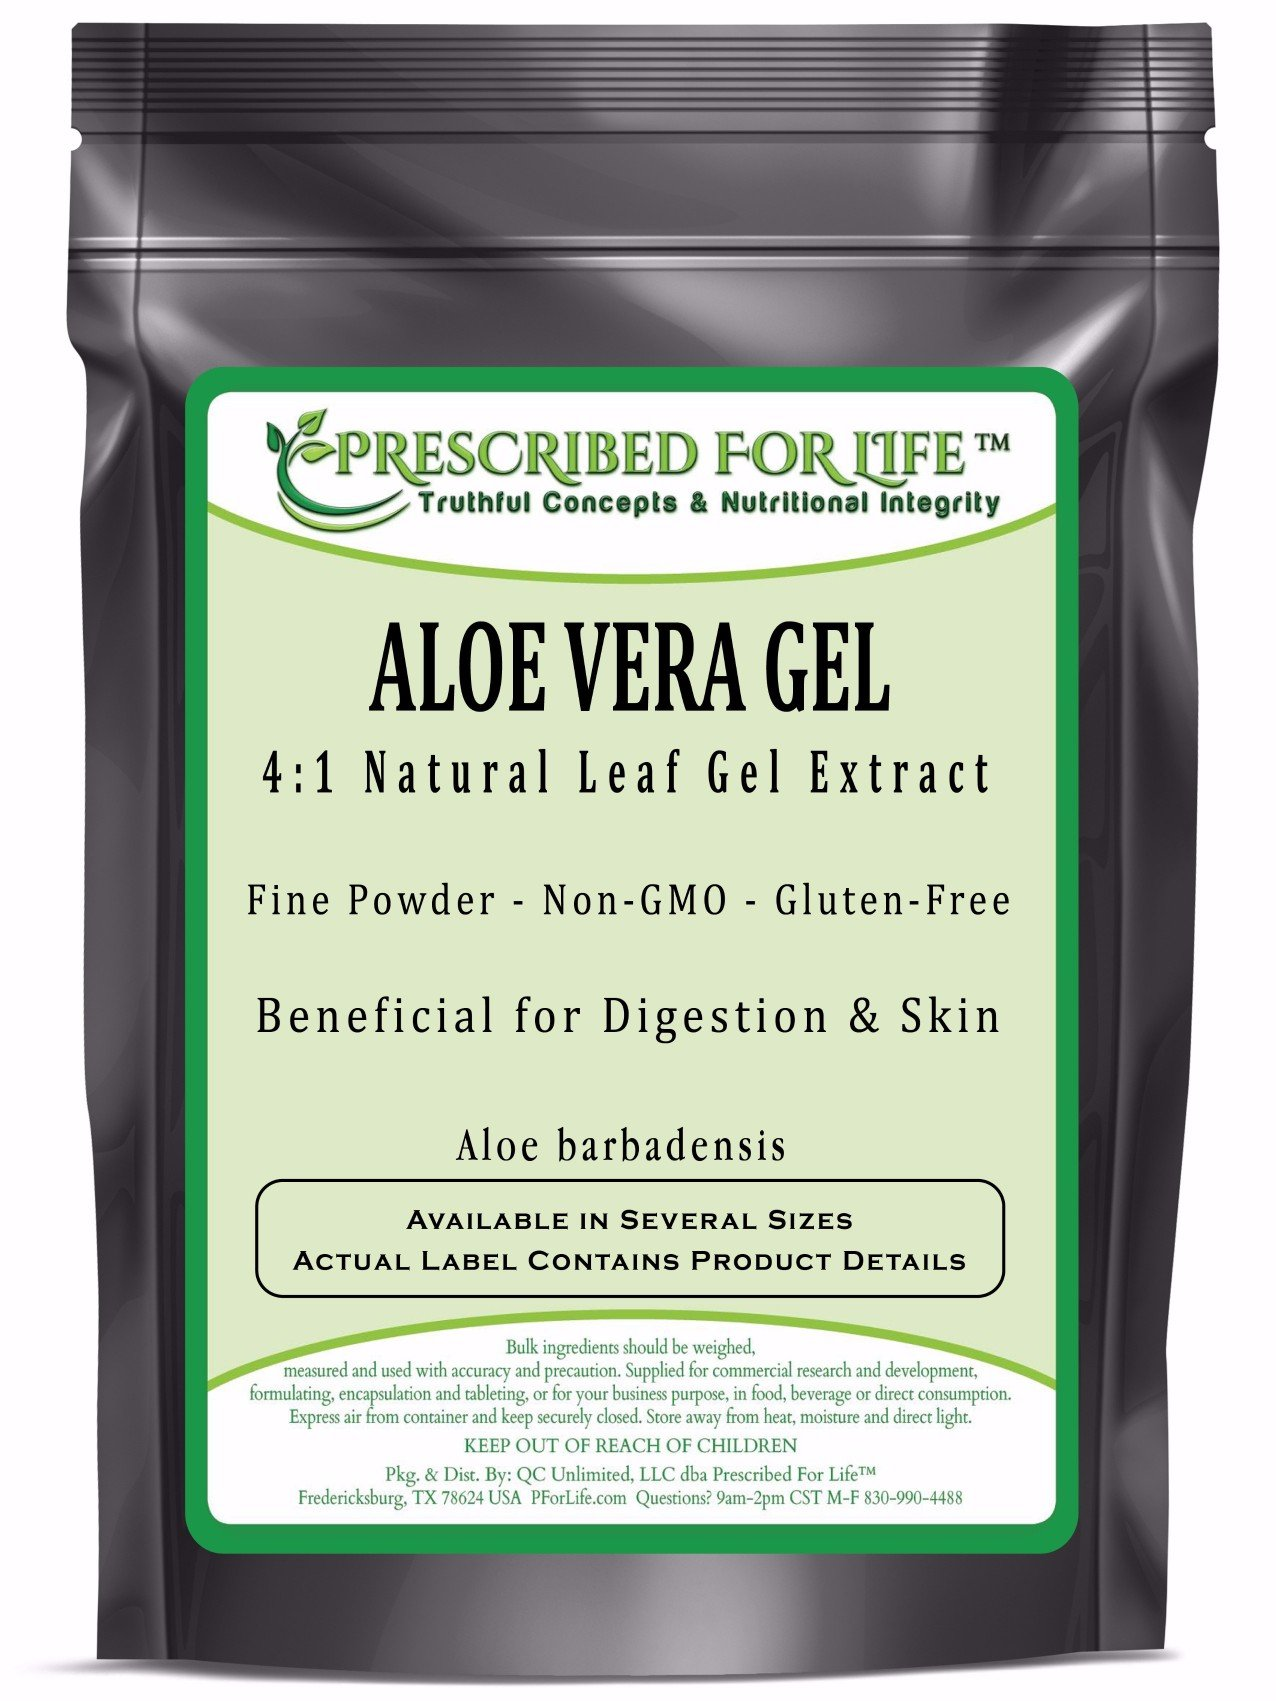 Aloe Vera - 4:1 Natural Leaf Gel Extract Powder (Aloe barbadensis), 55 lb